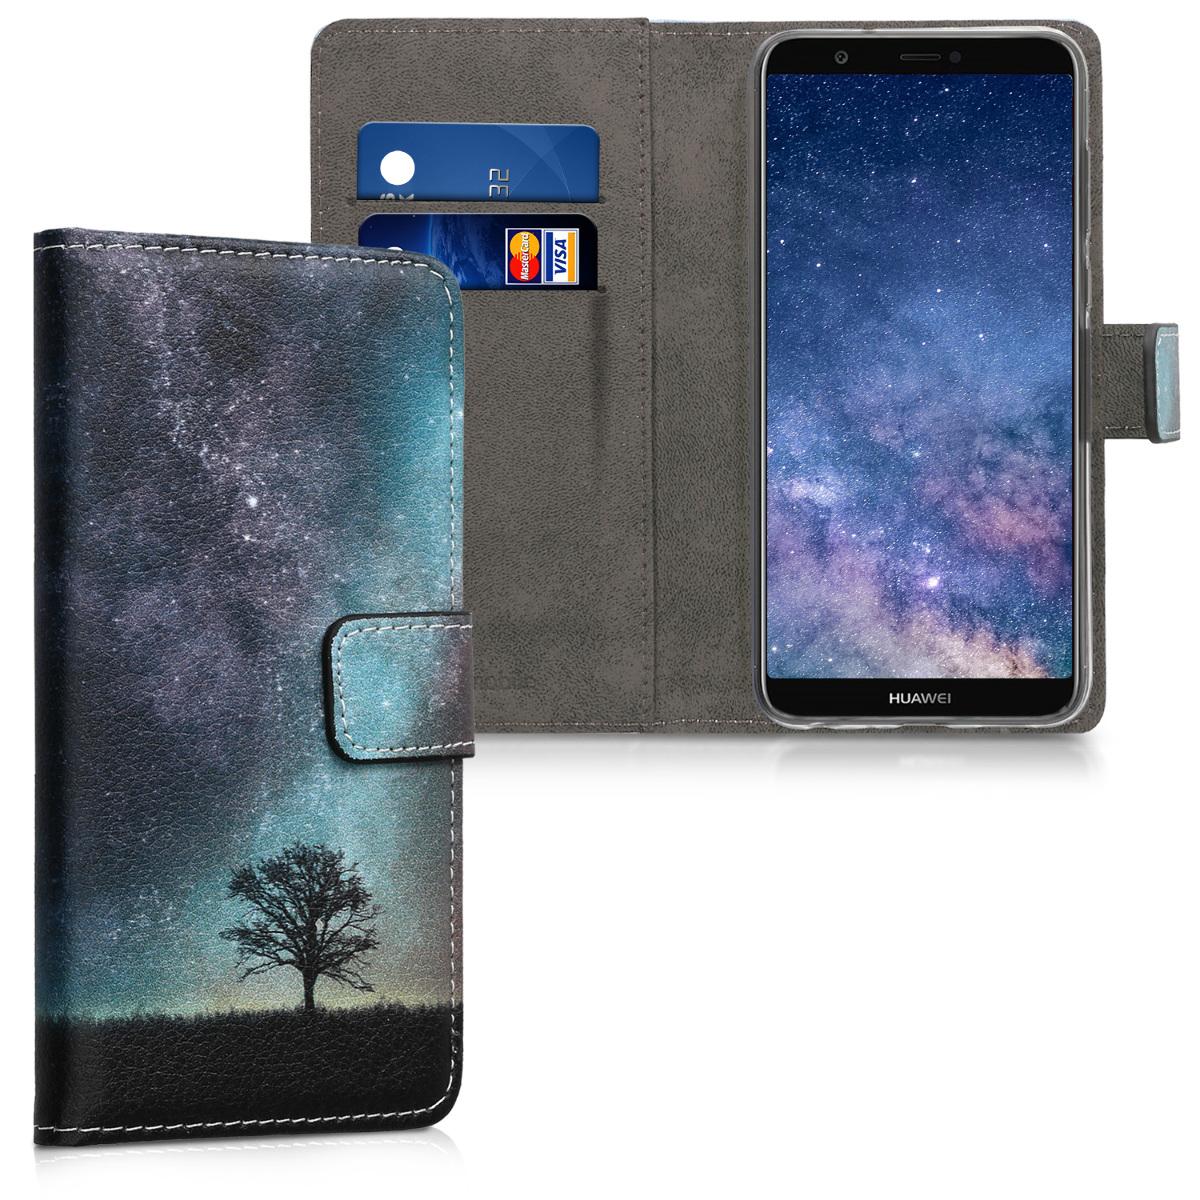 KW Θήκη - Πορτοφόλι Huawei P Smart 2018 - Galaxy Tree (44693.05)